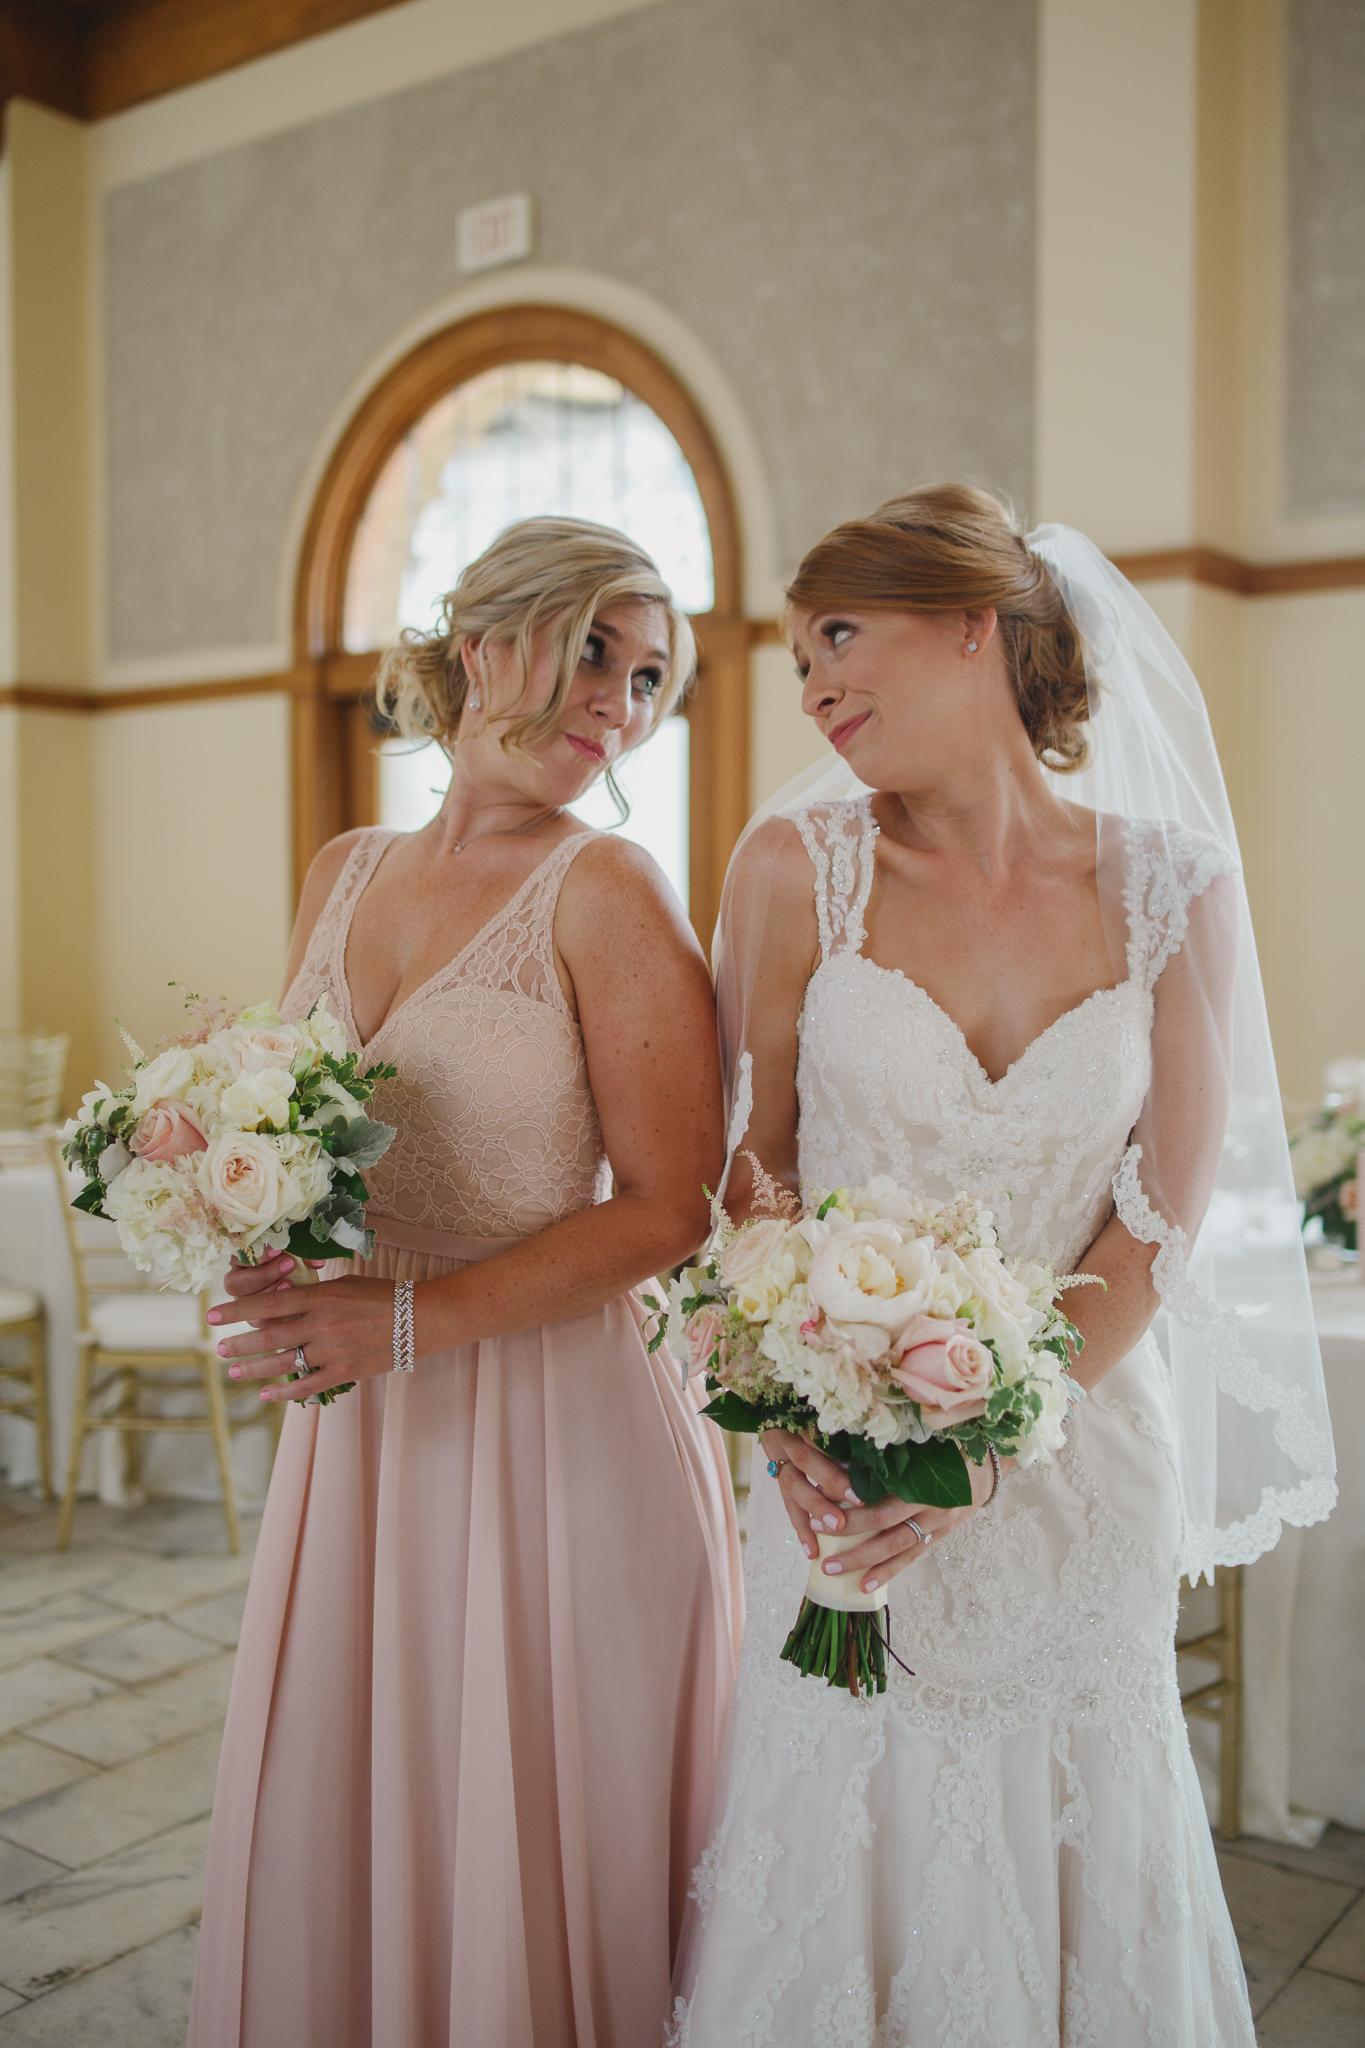 Michael and Kelly - the ashton depot - wedding DFW - wedding photographer- elizalde photography (60 of 150).jpg